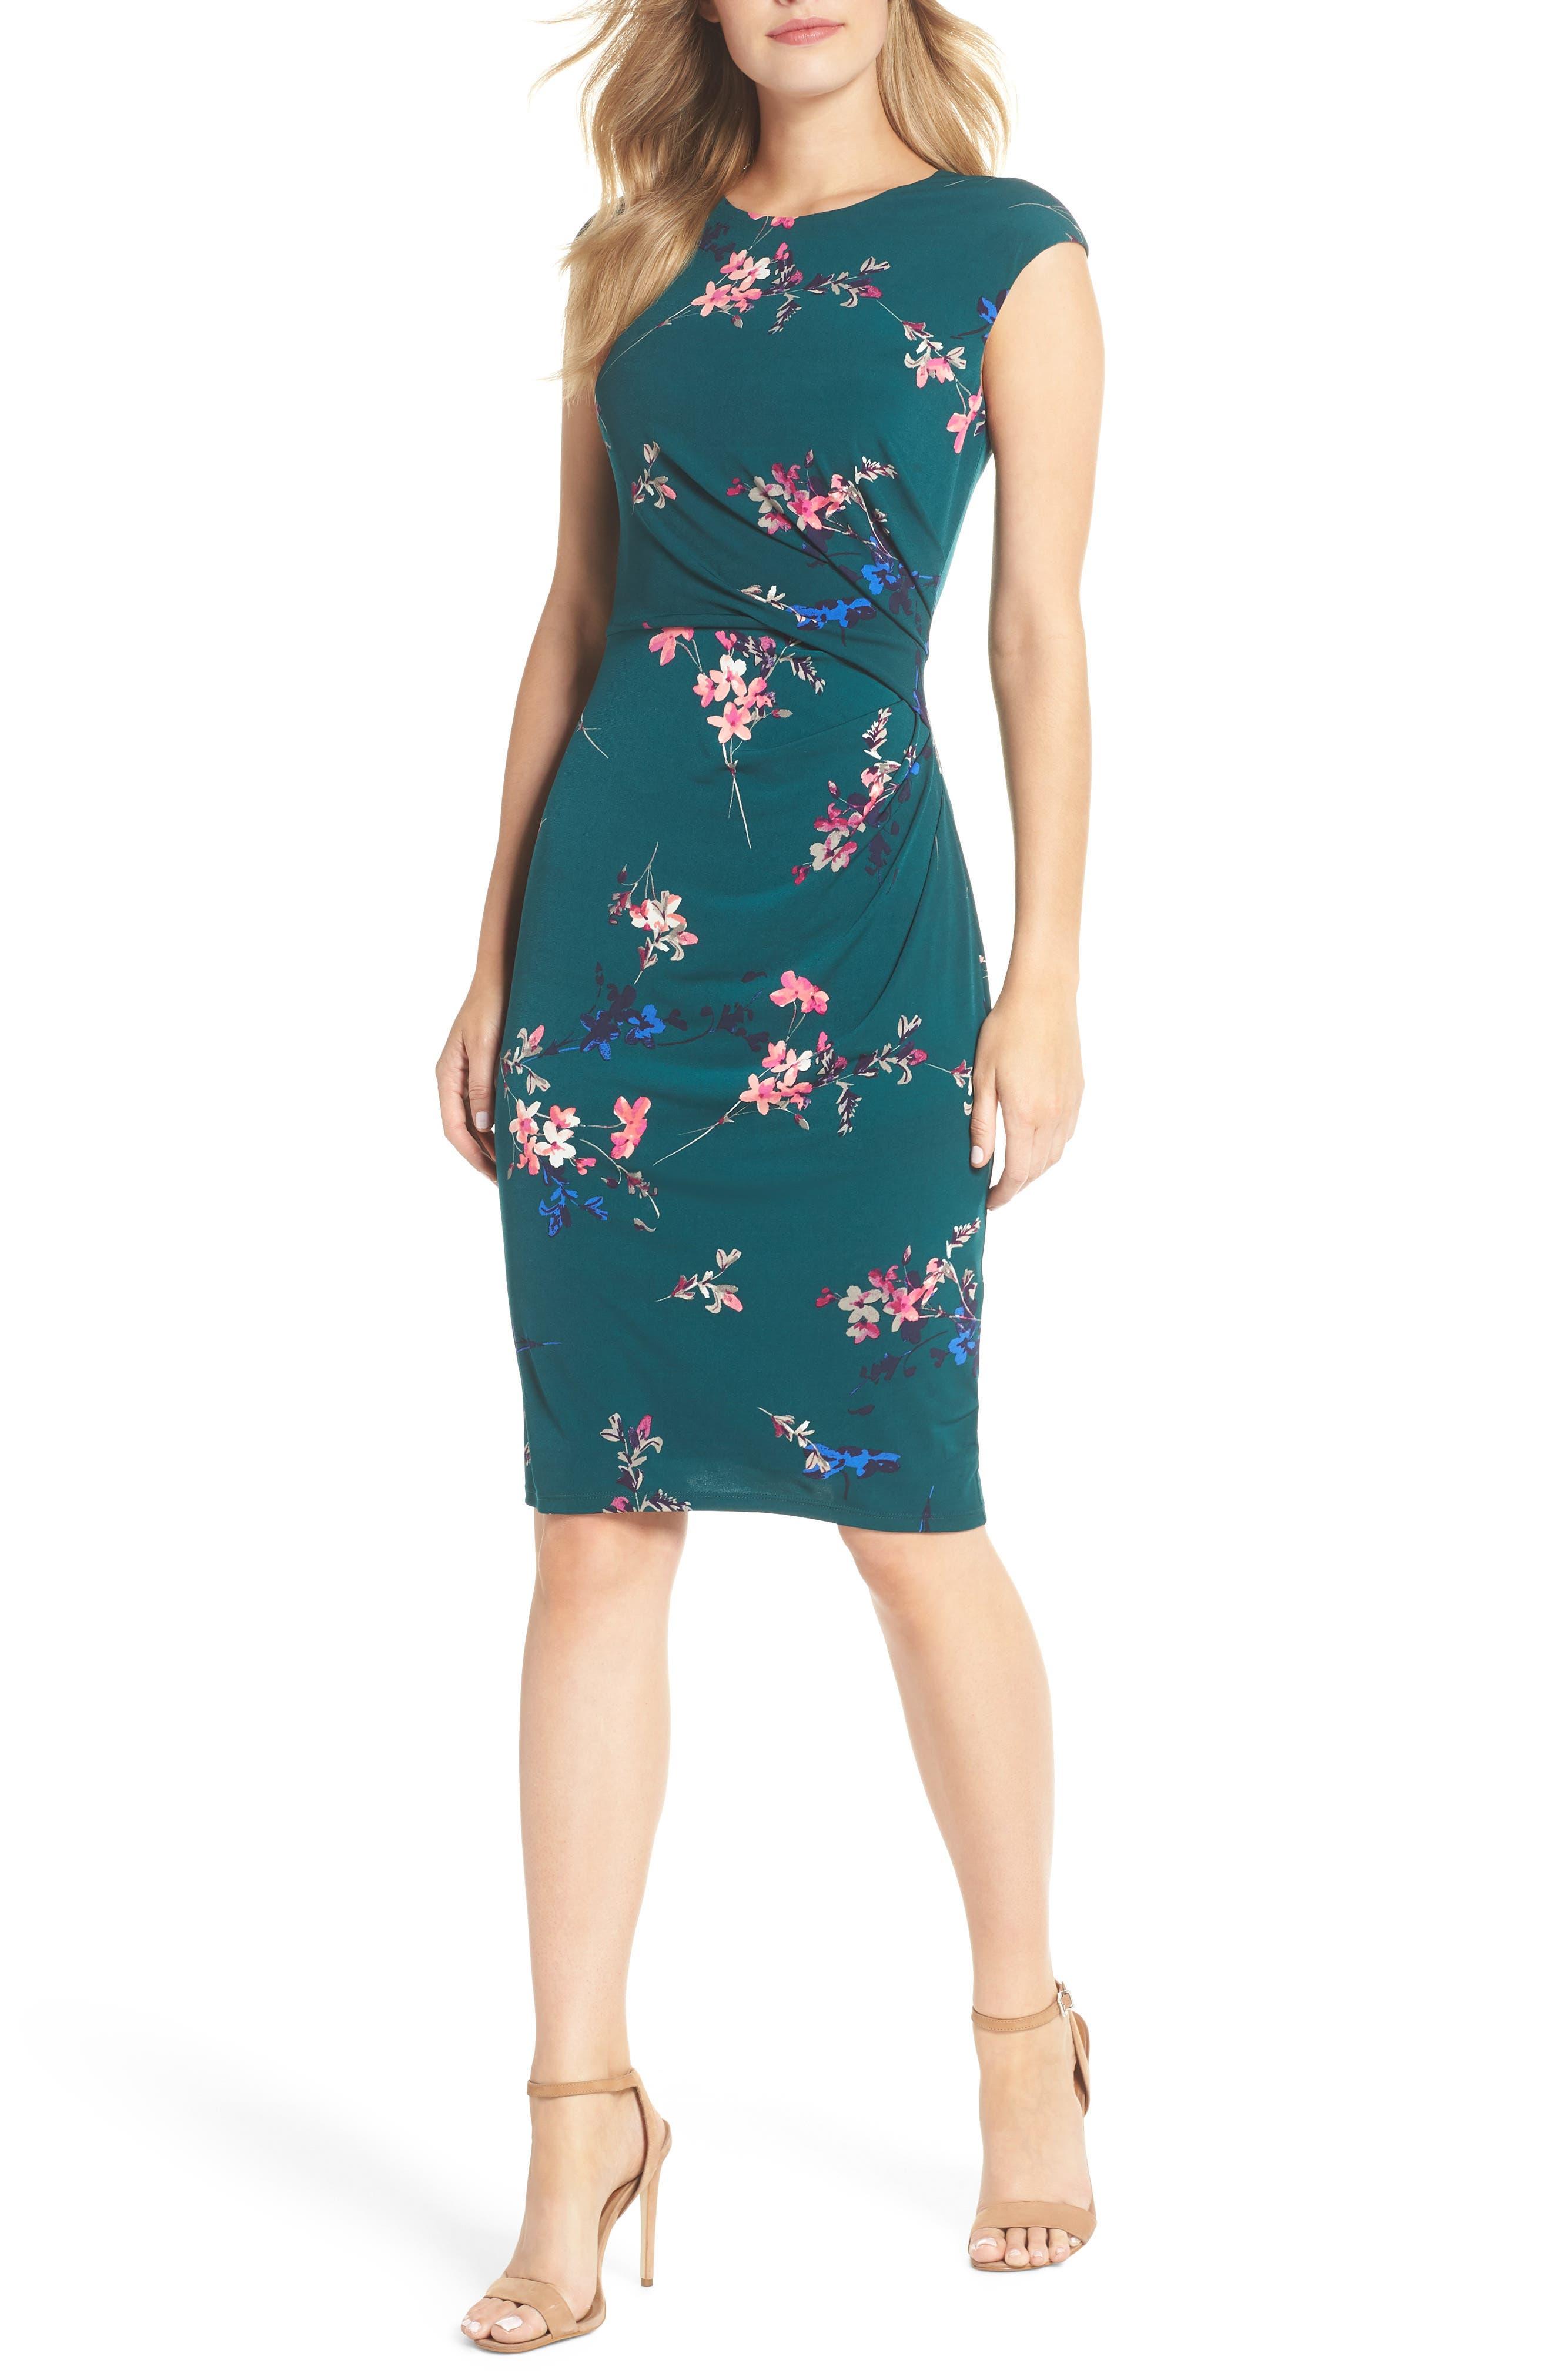 Eliza J Cap Sleeve Floral Print Sheath Dress, 8 (similar to 1) - Green